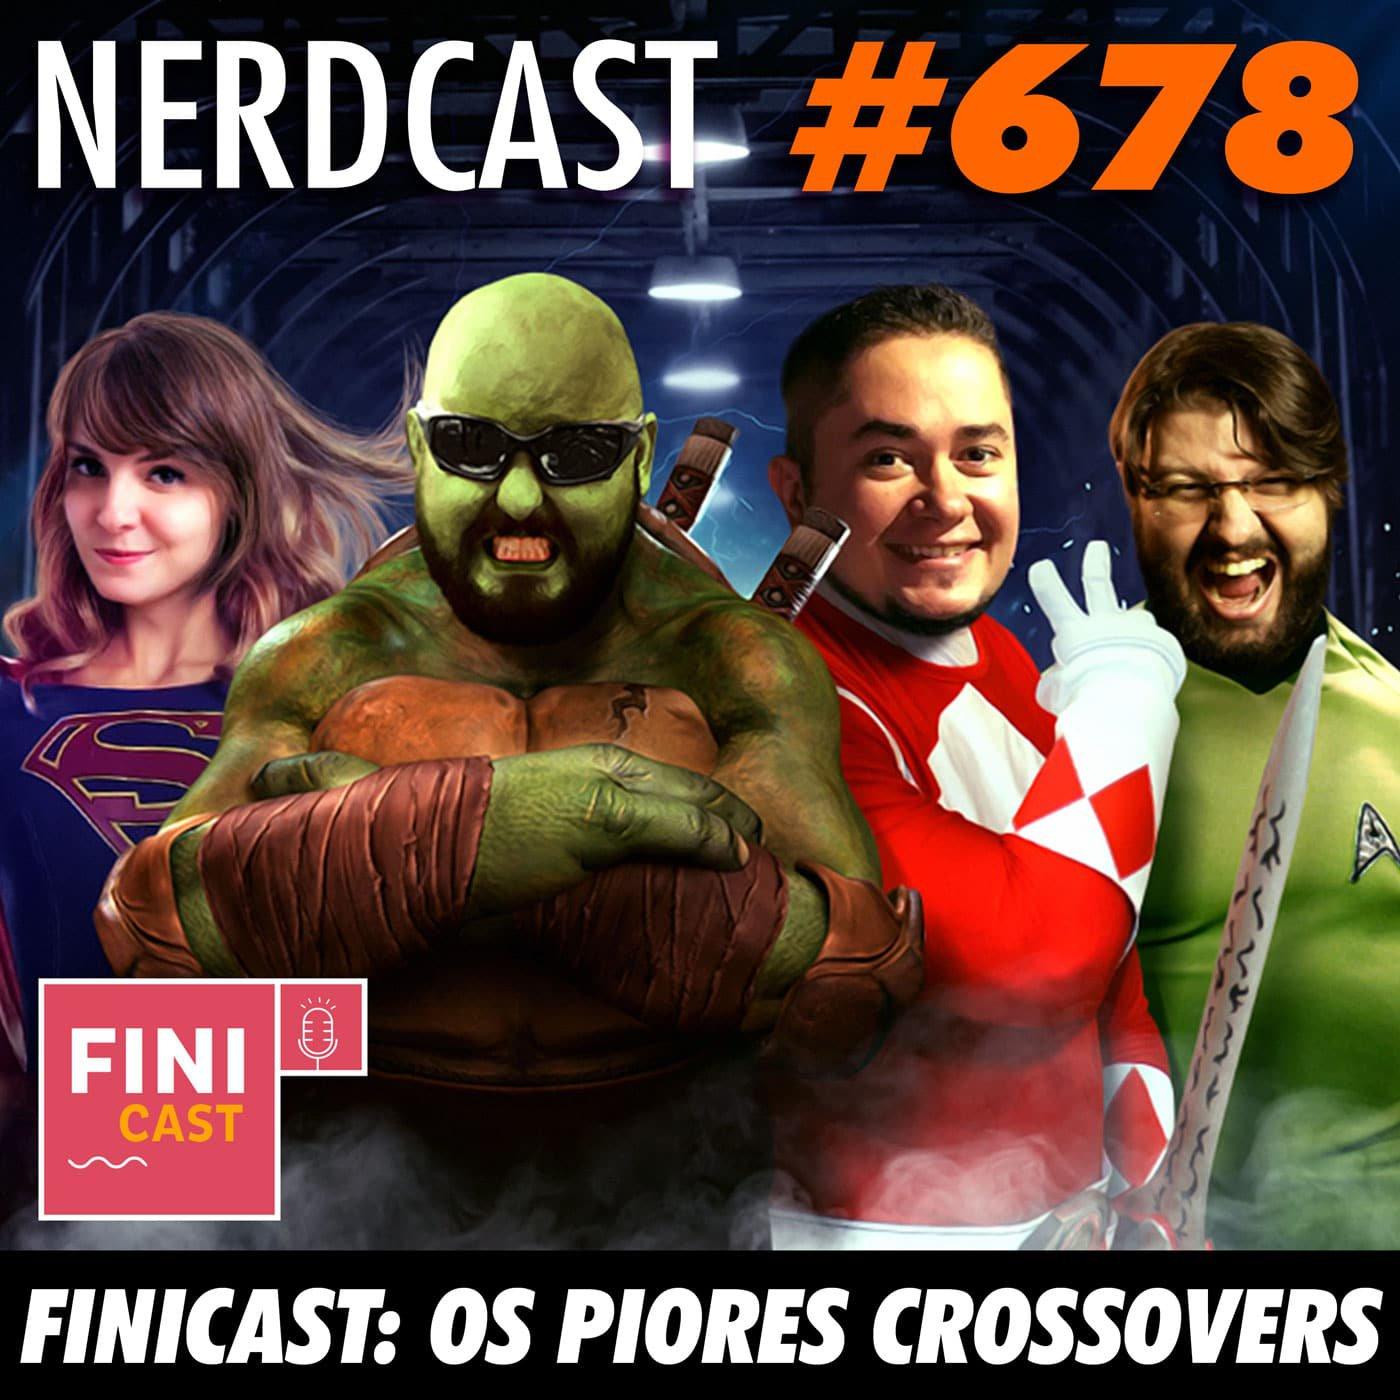 NerdCast 678 - Os Piores Crossovers